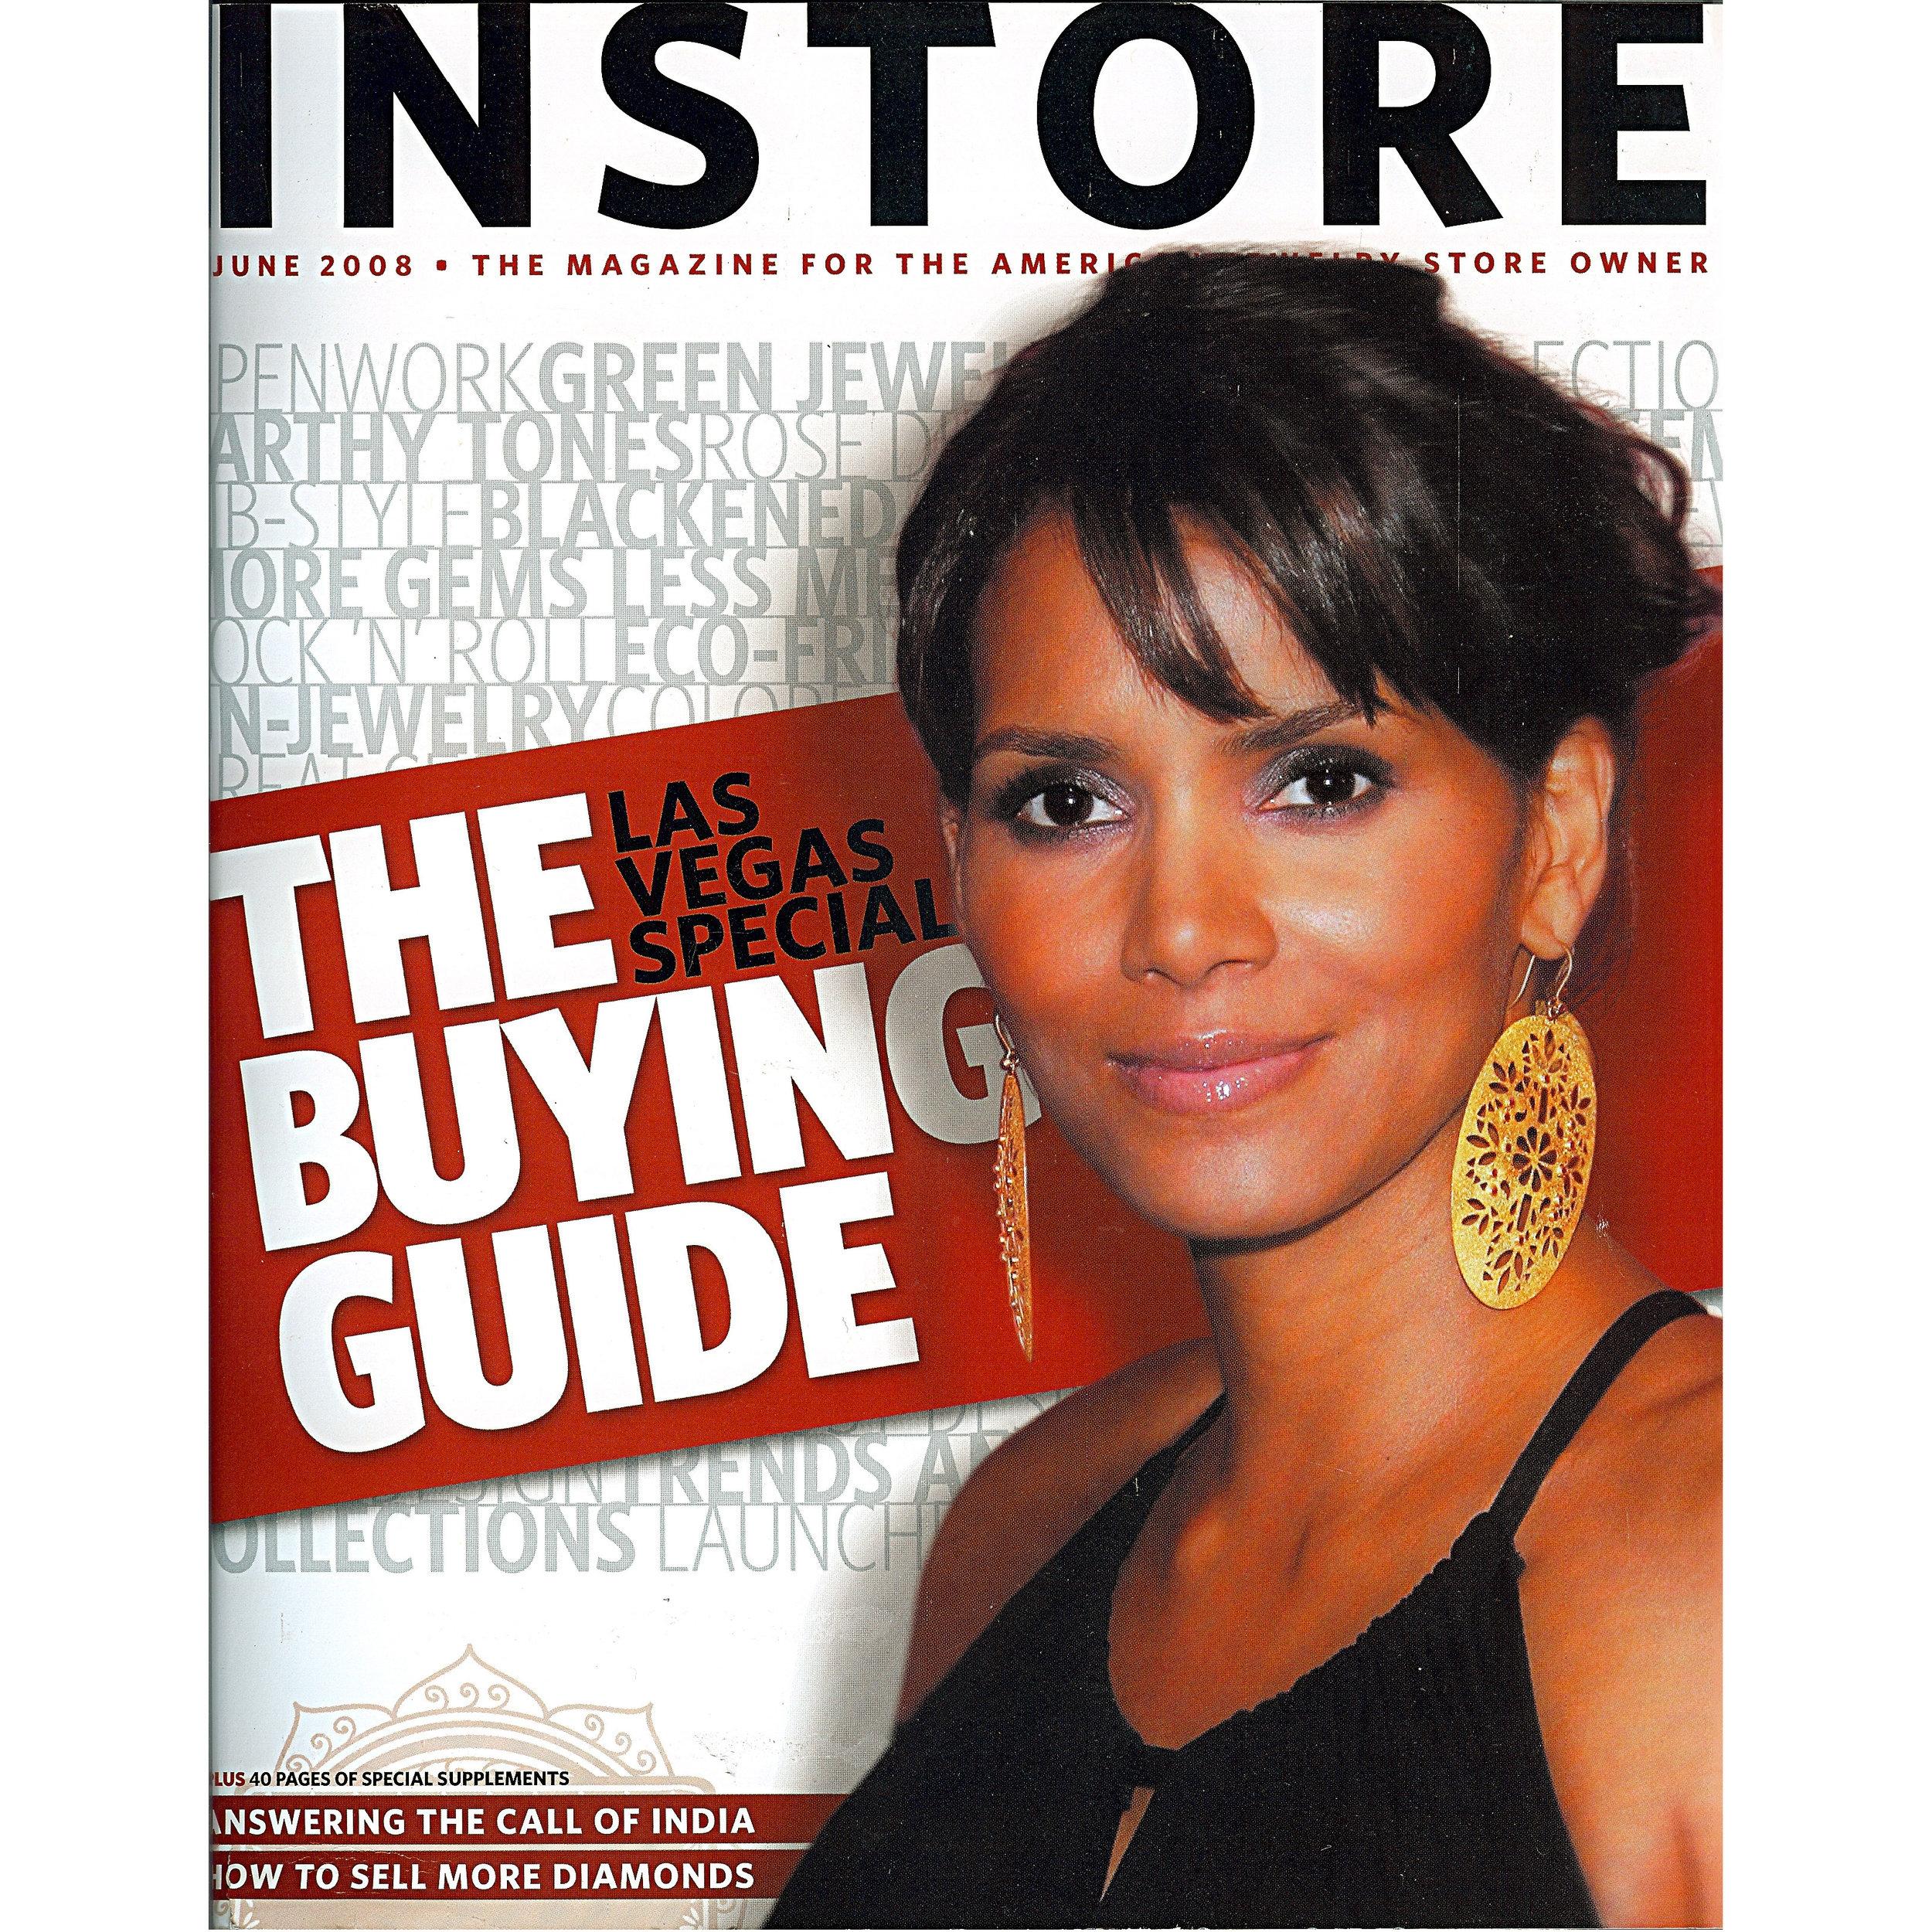 INSTORE - June 2008